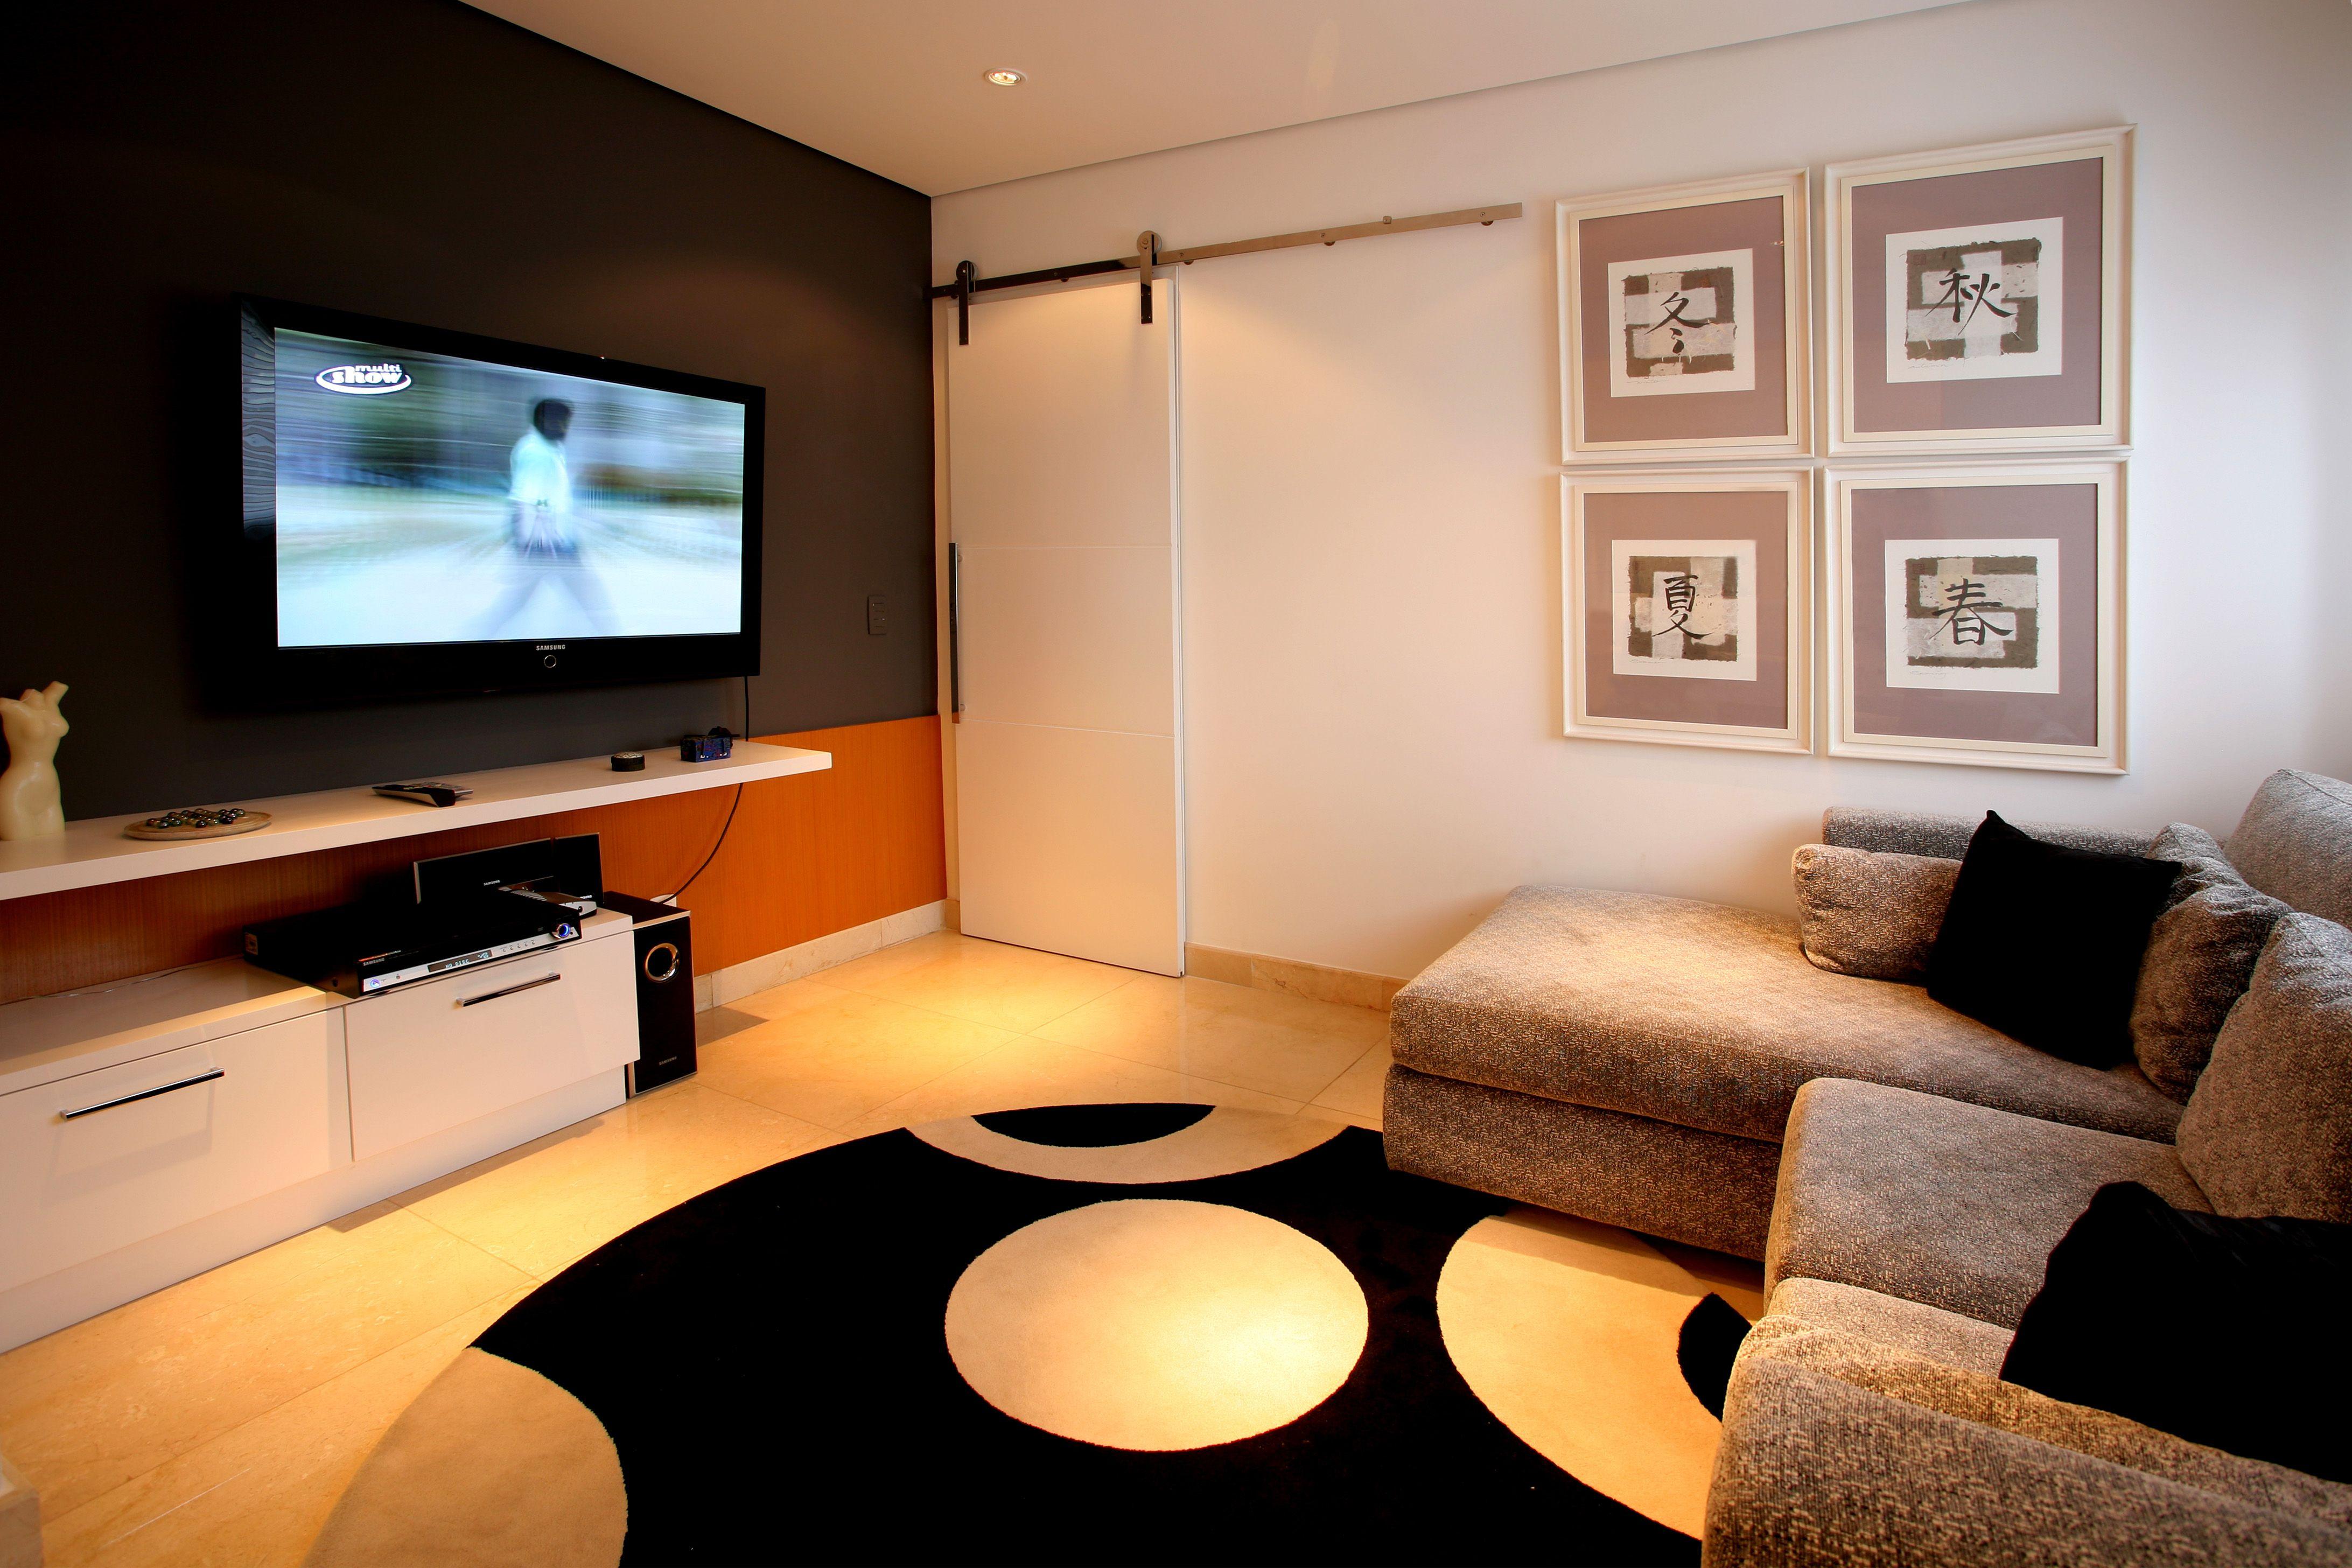 Home Theater For The Home Pinterest Living Room Ideas Room  -> Medidas De Una Sala De Tv